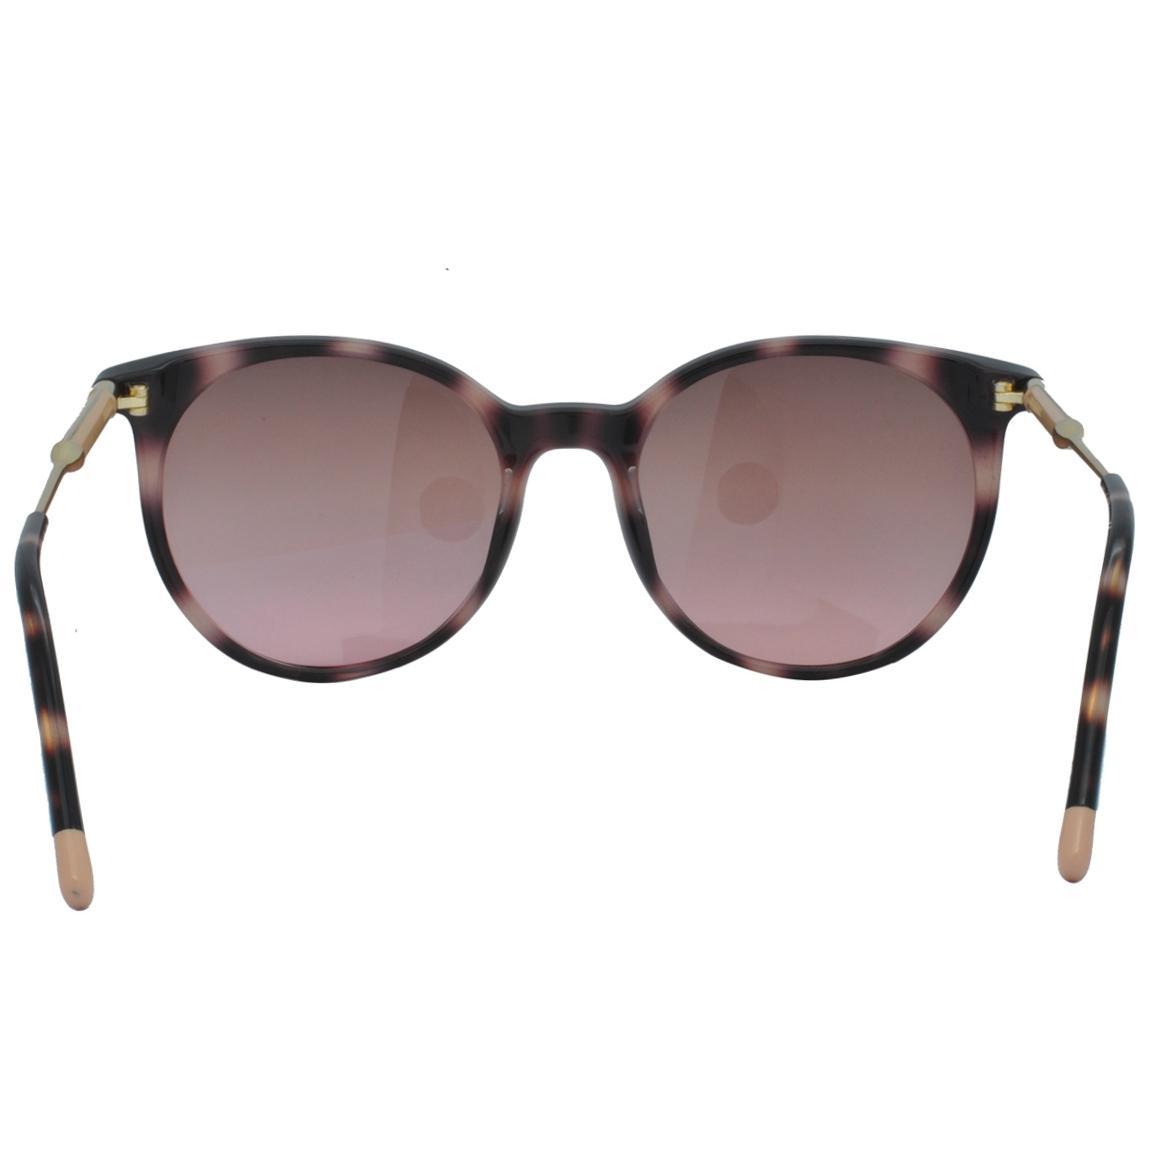 7b5b4cd3f401a Óculos de Sol Calvin Klein Feminino CK3208S 669 - Acetato Tartaruga Marrom  e Lente Marrom Degradê R  691